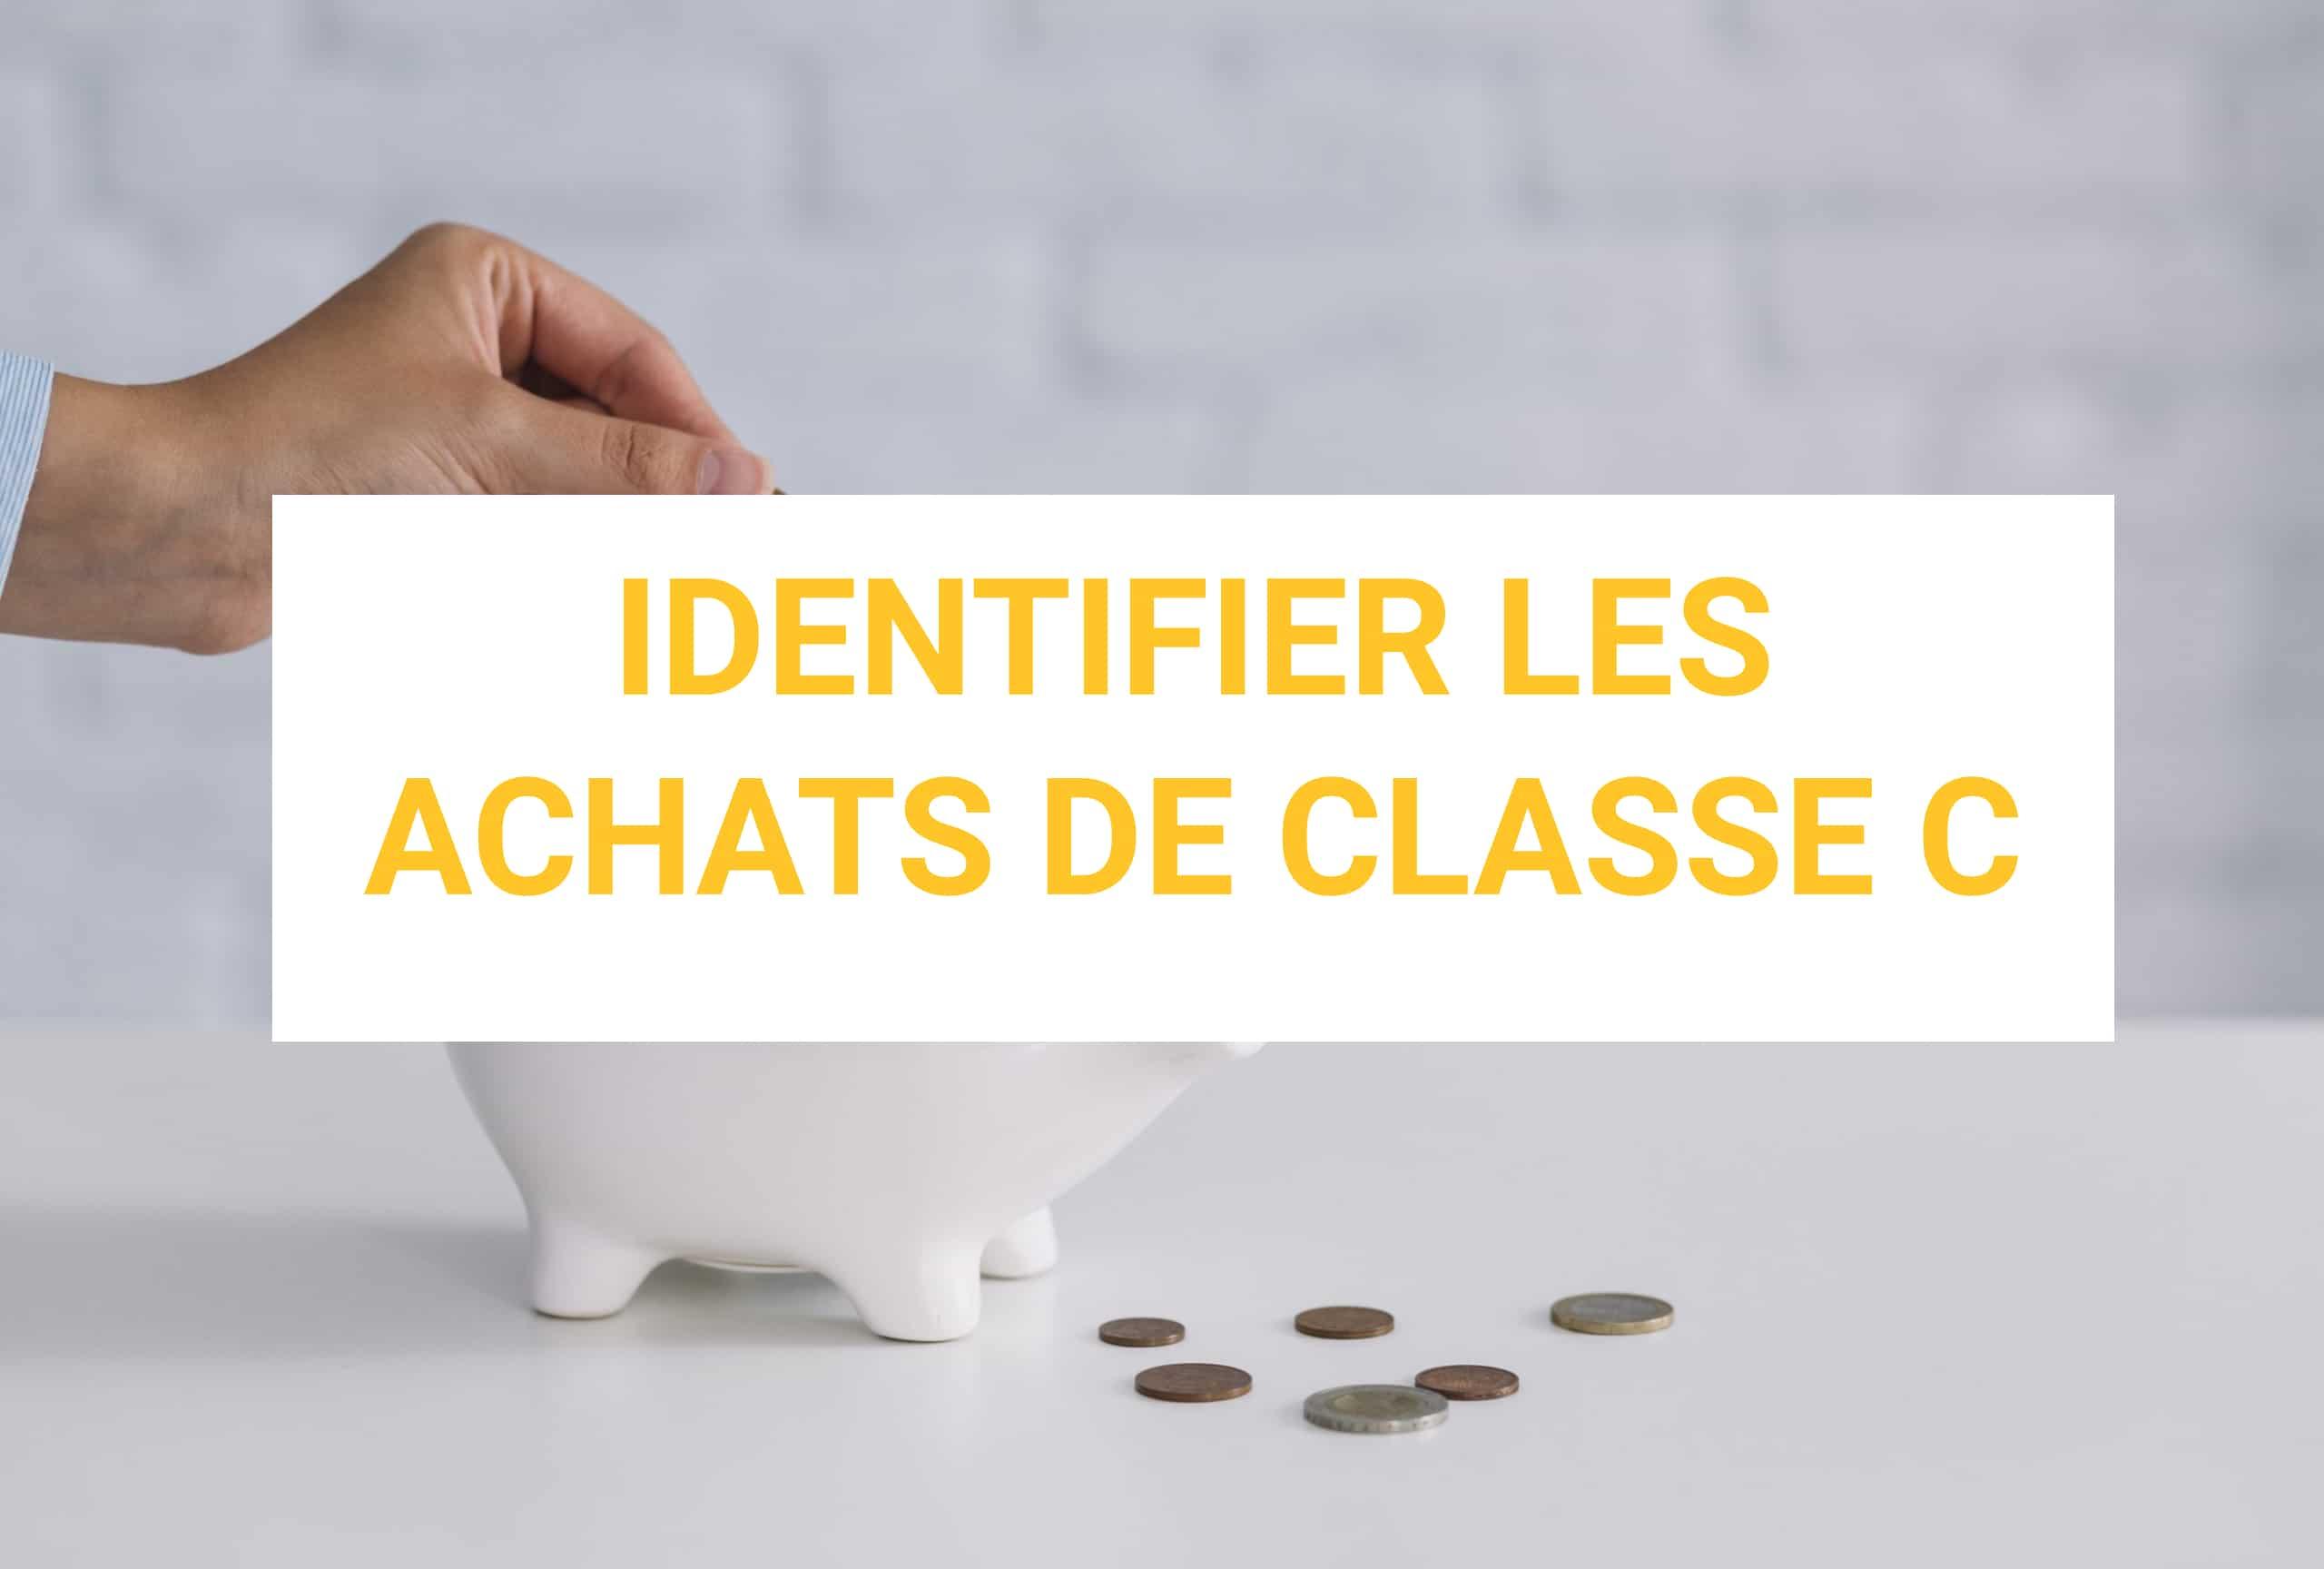 identifier achats classe c